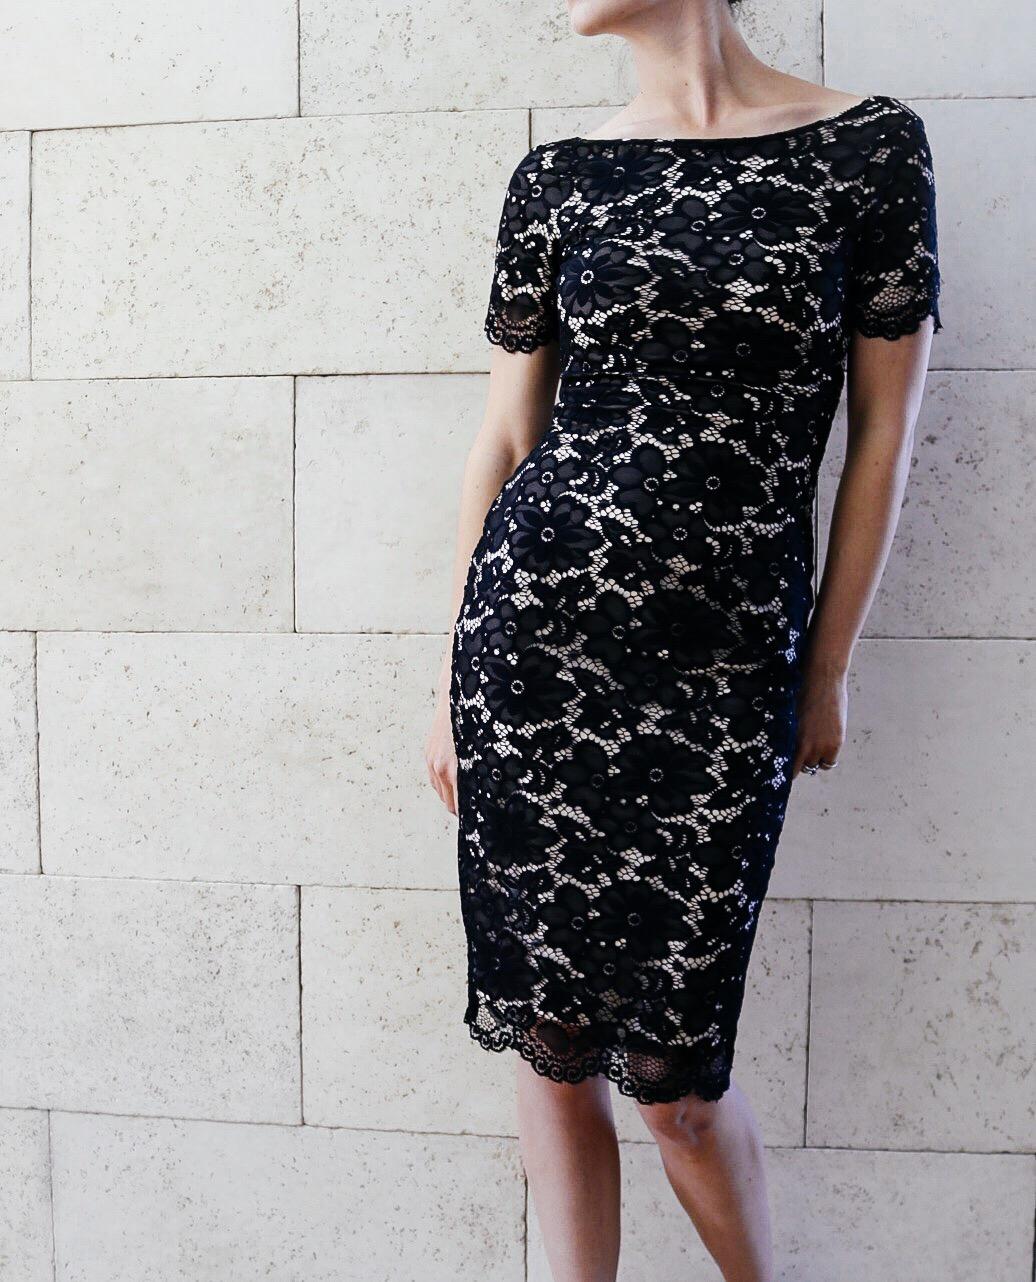 Bombshell Dress Tutorial